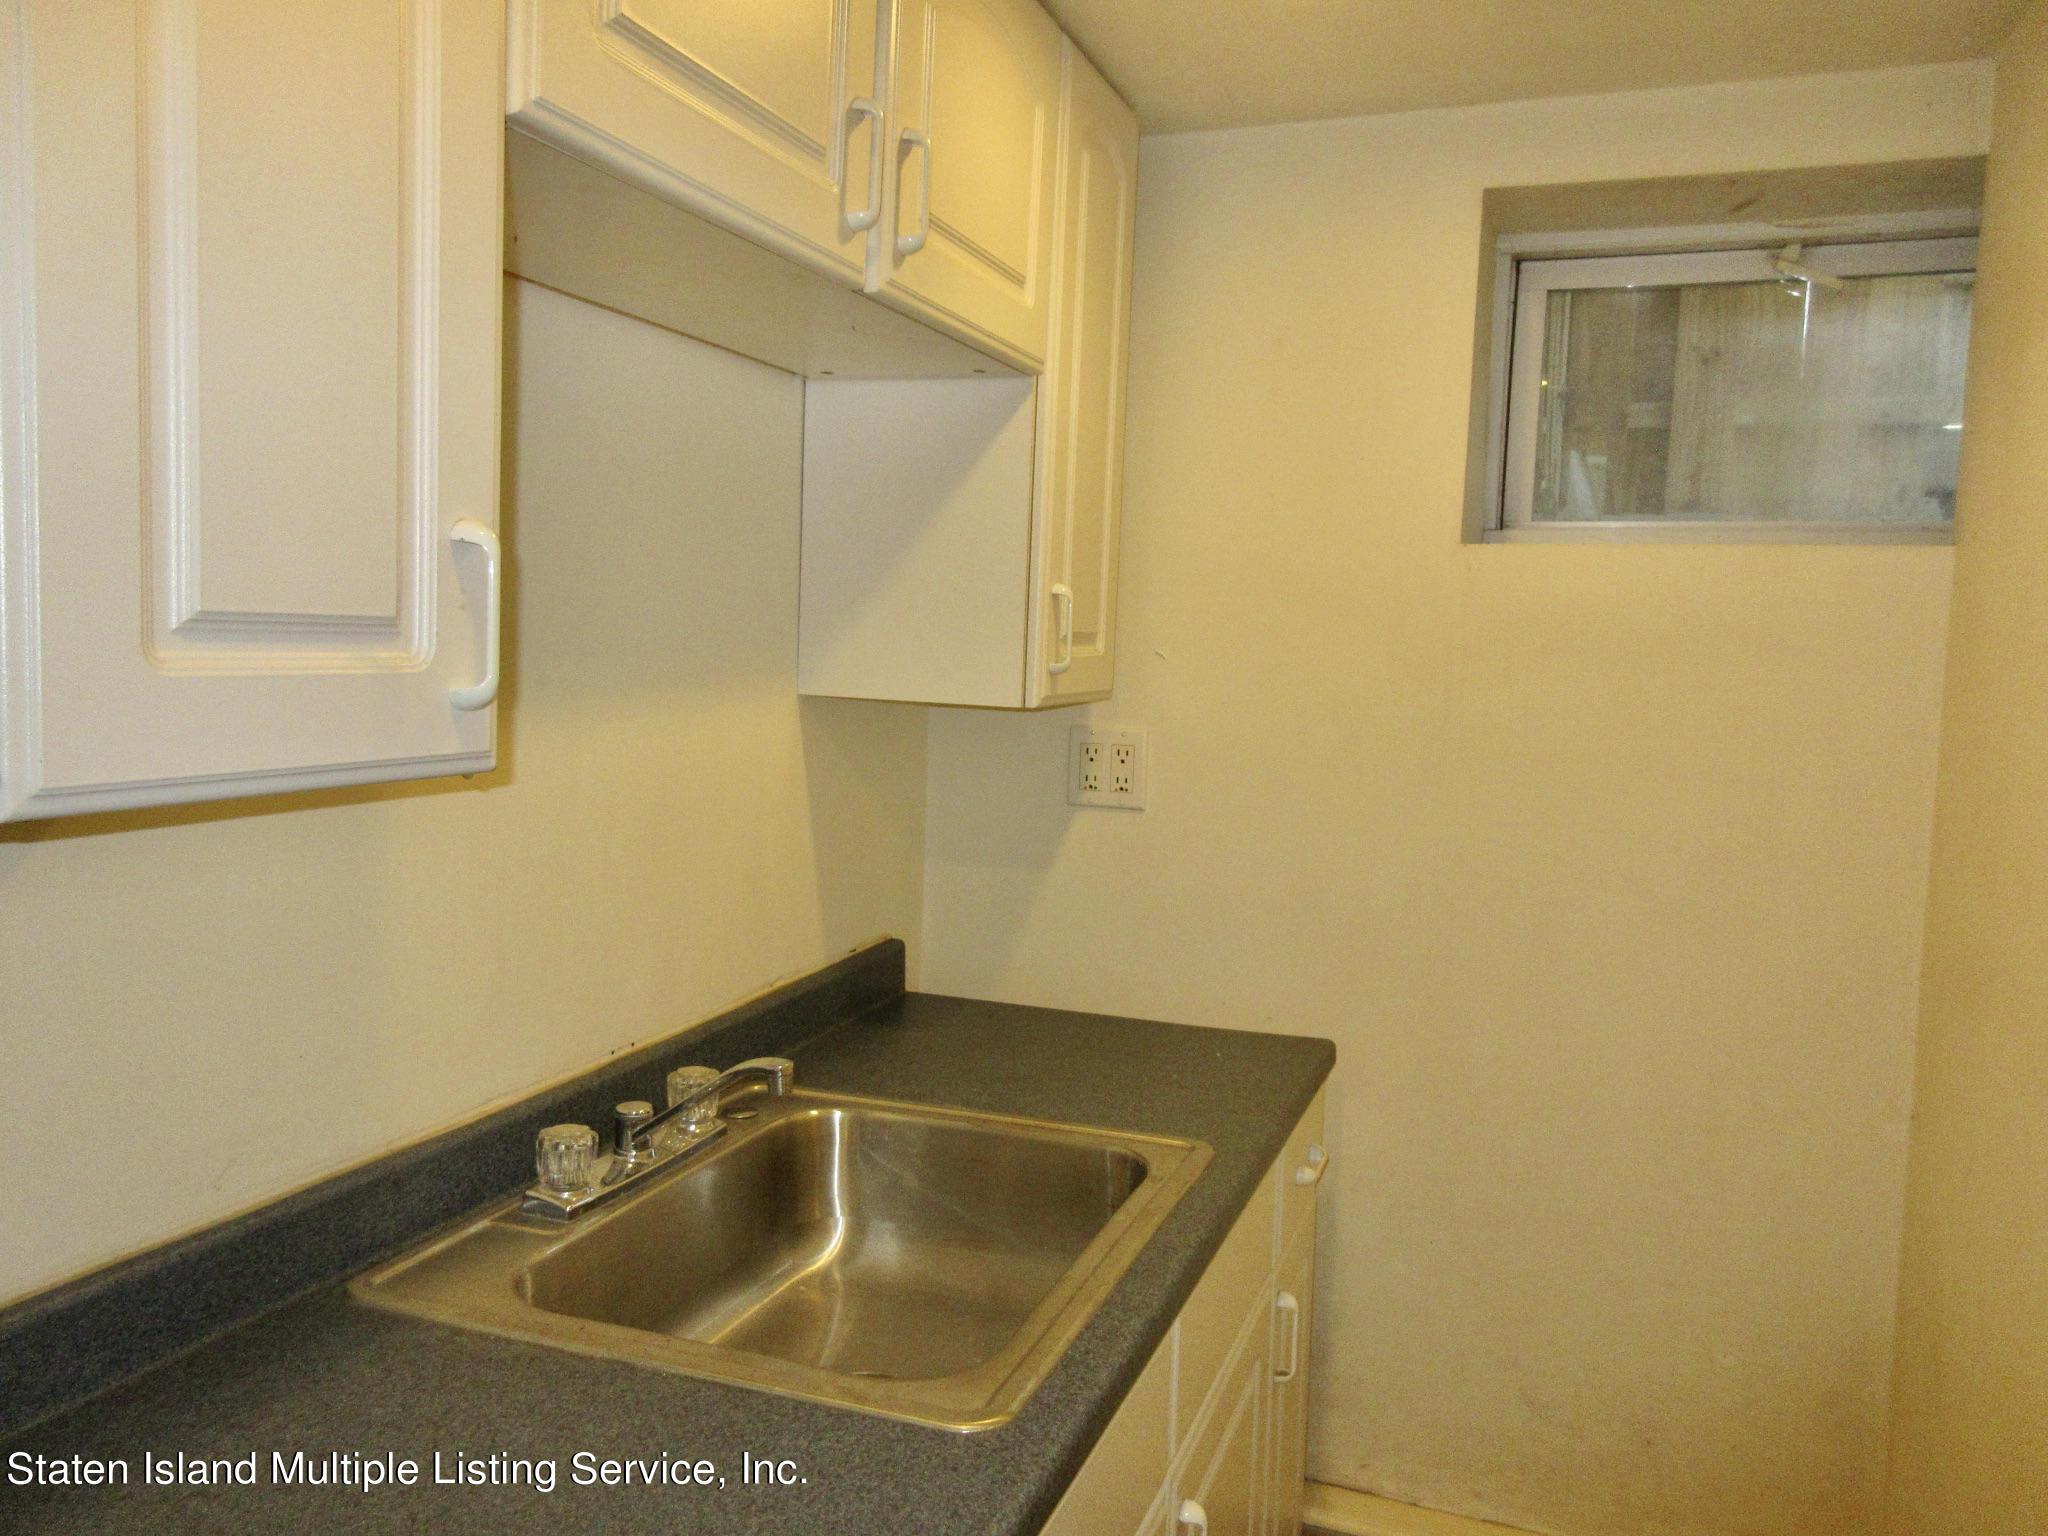 Two Family - Detached 89-91 David Street  Staten Island, NY 10308, MLS-1146516-26